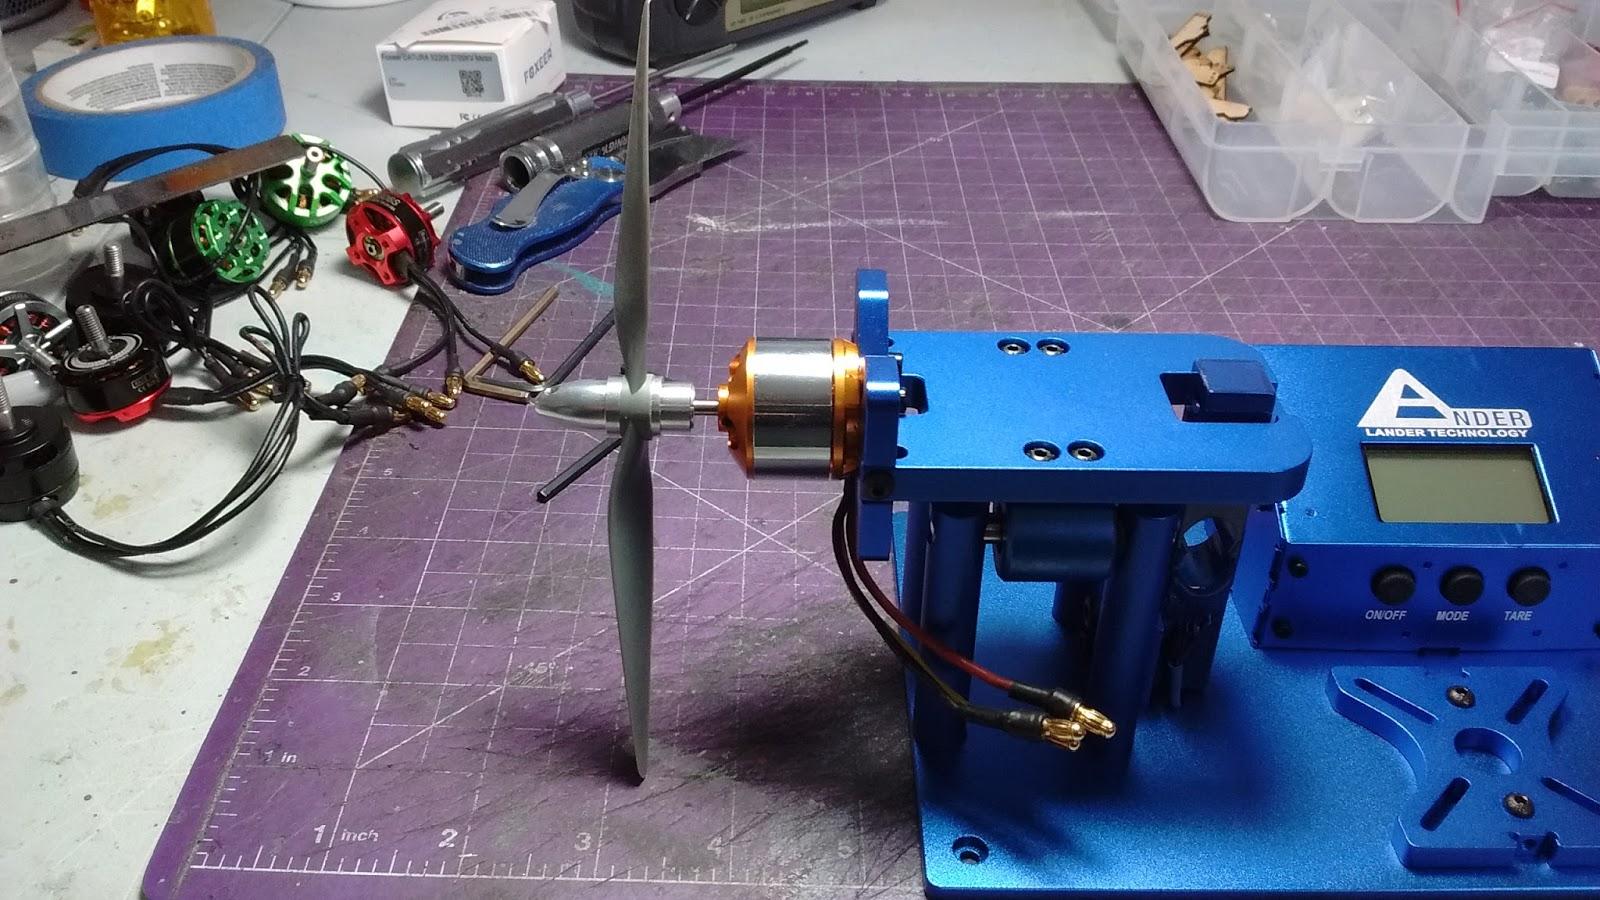 Scotts ParkJet blog: RC Lander thrust test stand initial